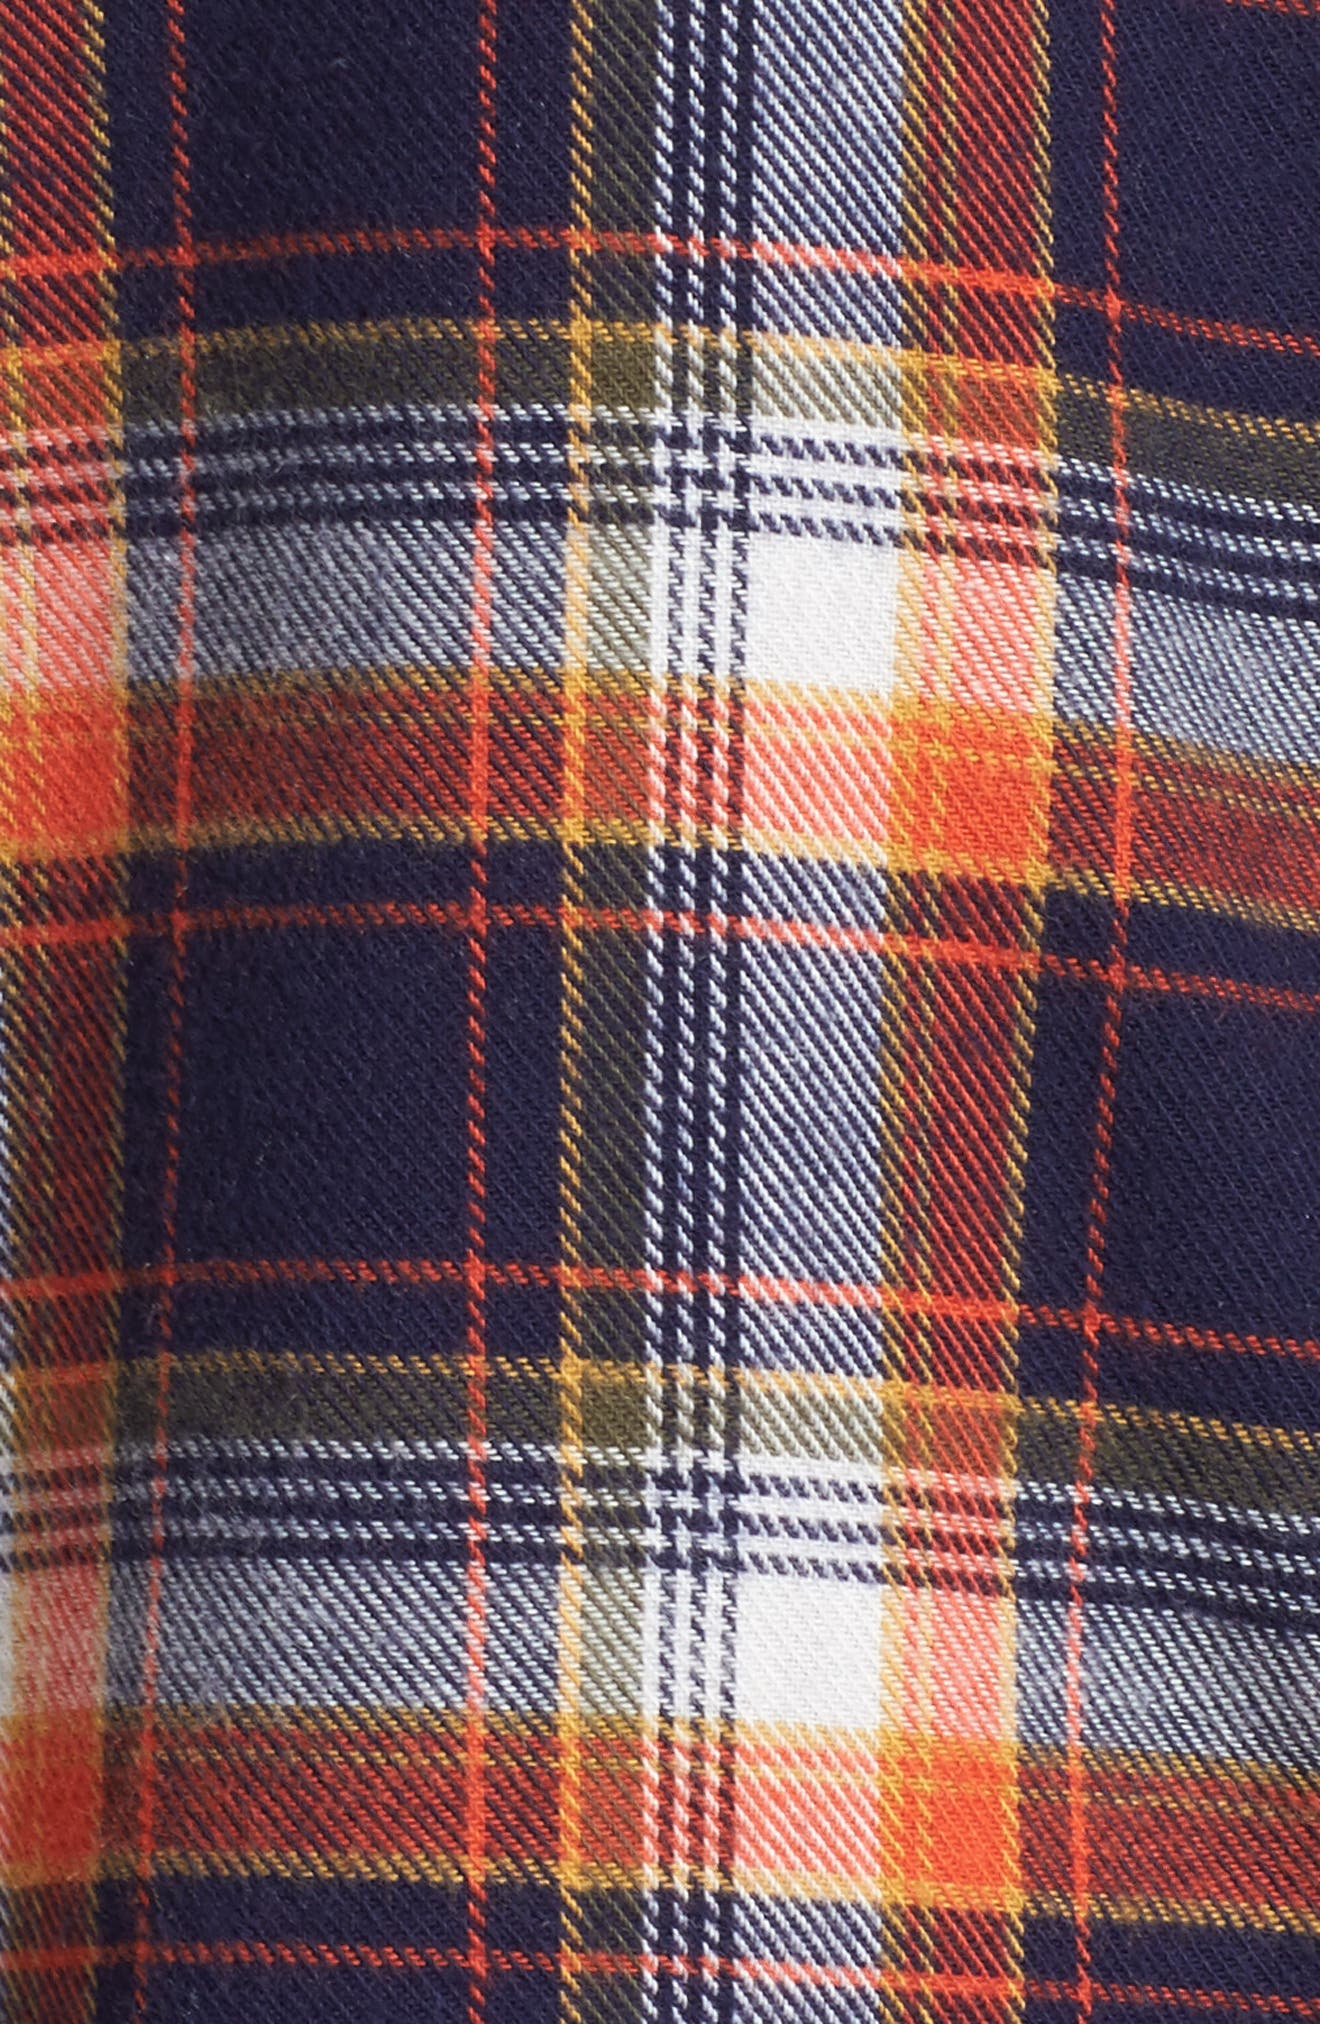 Flannel Nightshirt,                             Alternate thumbnail 6, color,                             Navy Dusk Preppy Plaid